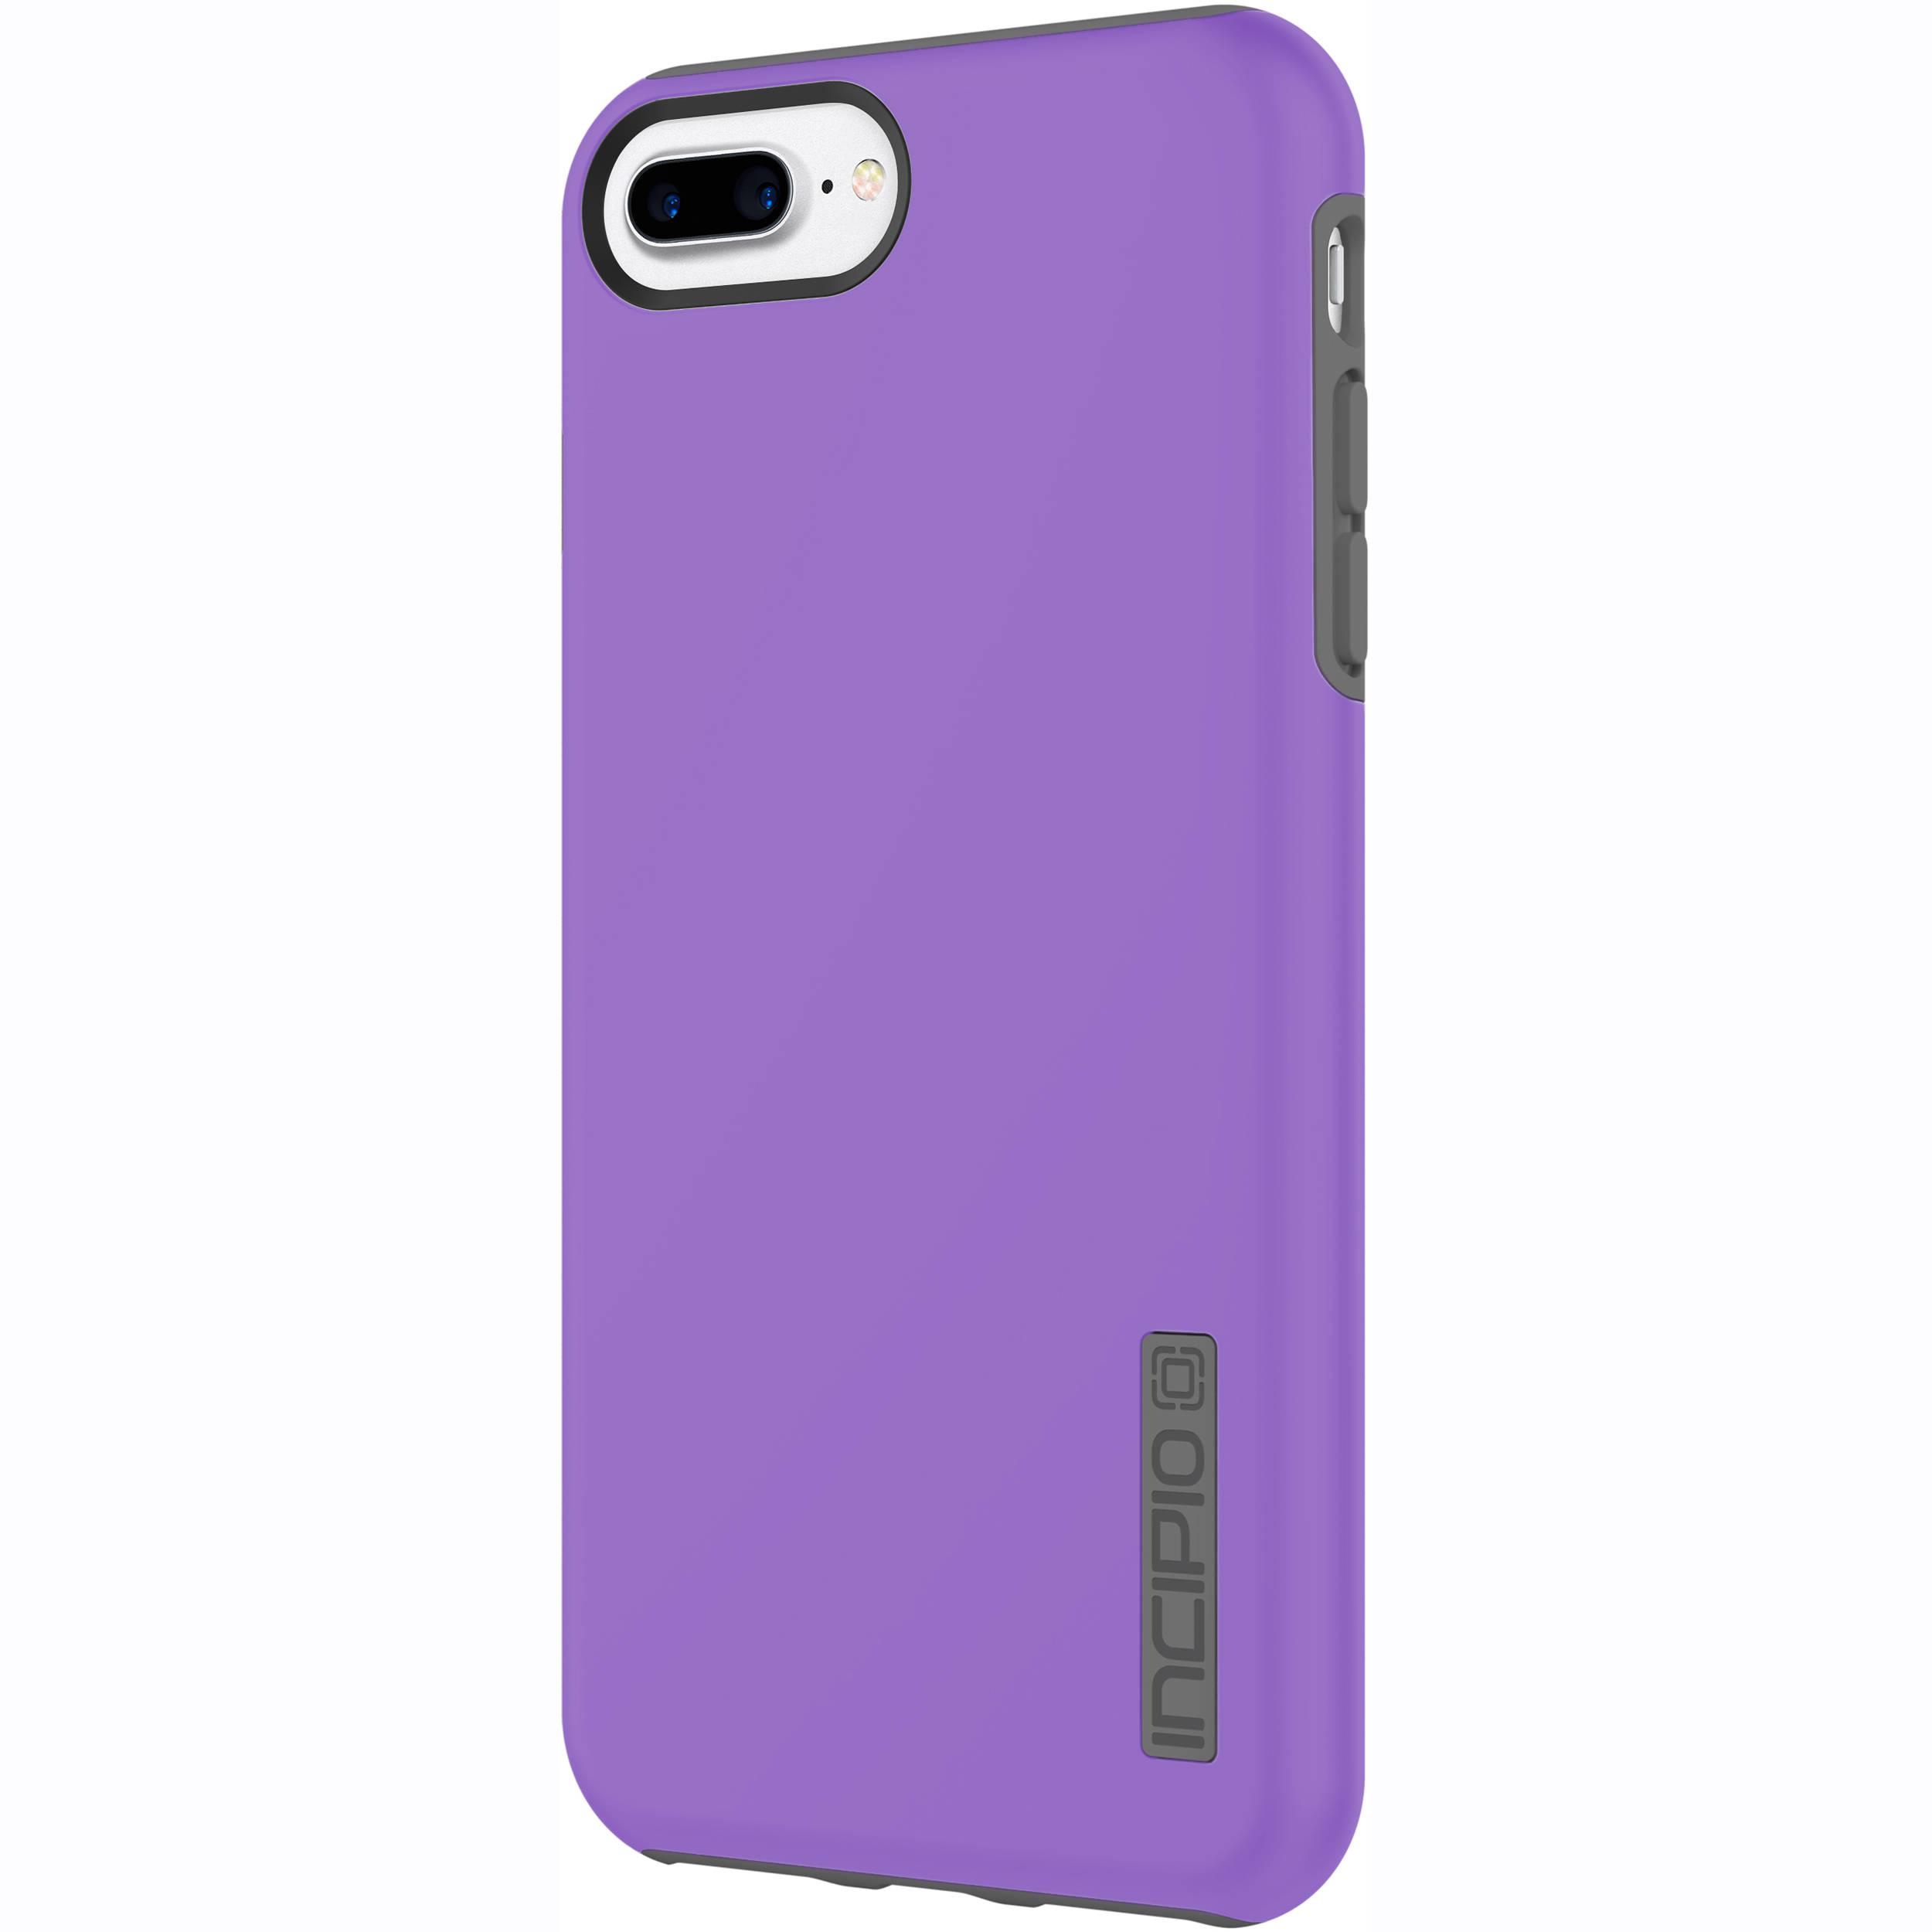 pretty nice 468de 27461 Incipio DualPro Case for iPhone 7 Plus (Purple/Charcoal)